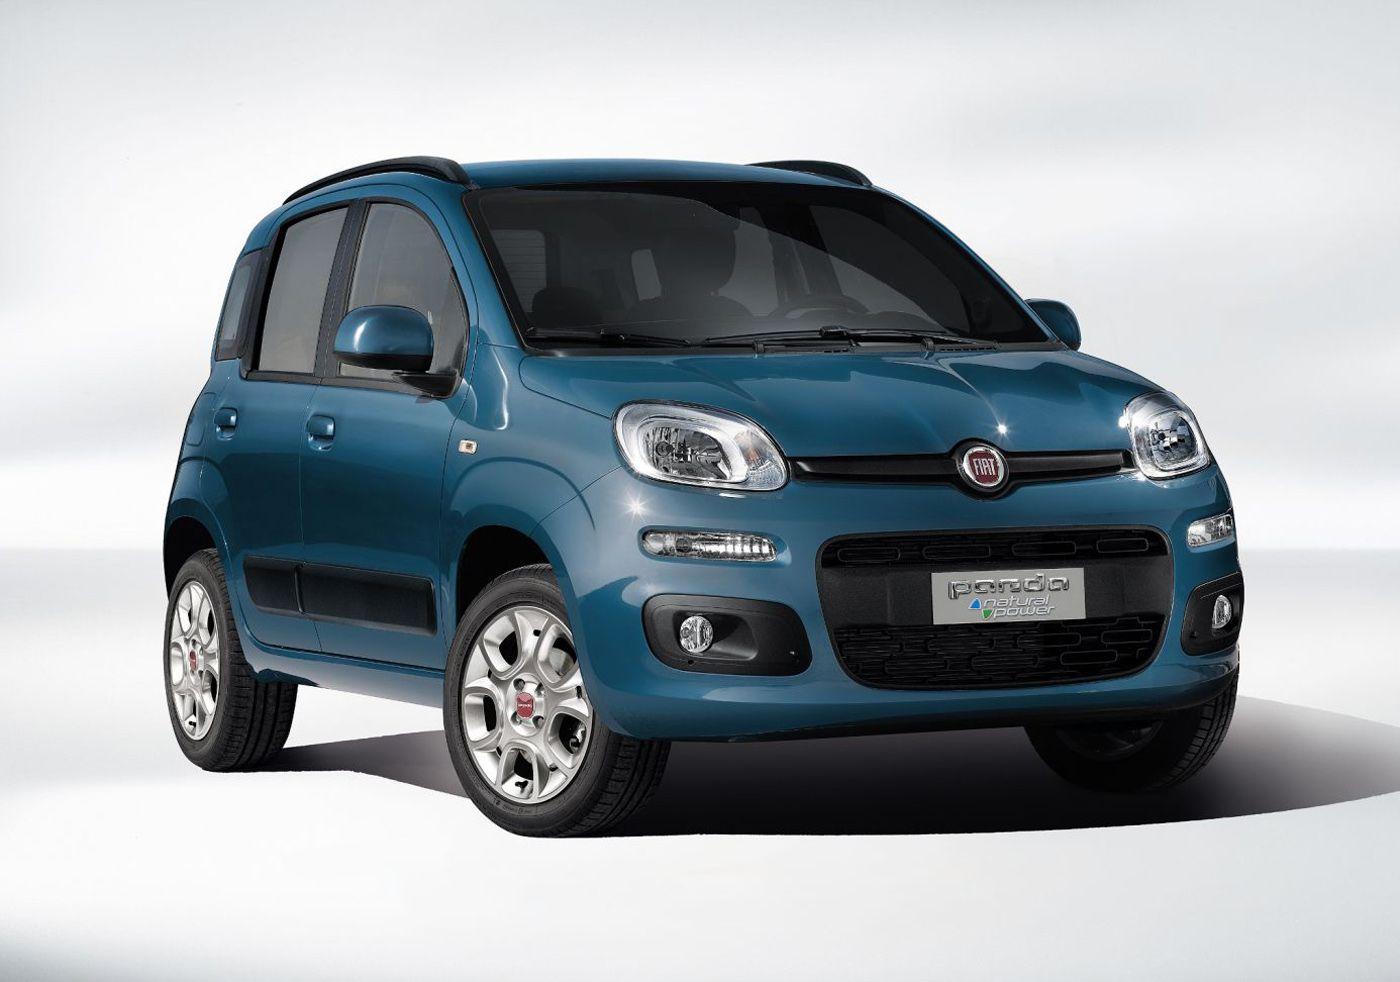 750 000 Fiat Me Fysiko Aerio Fiat Panda Fiat Automobile